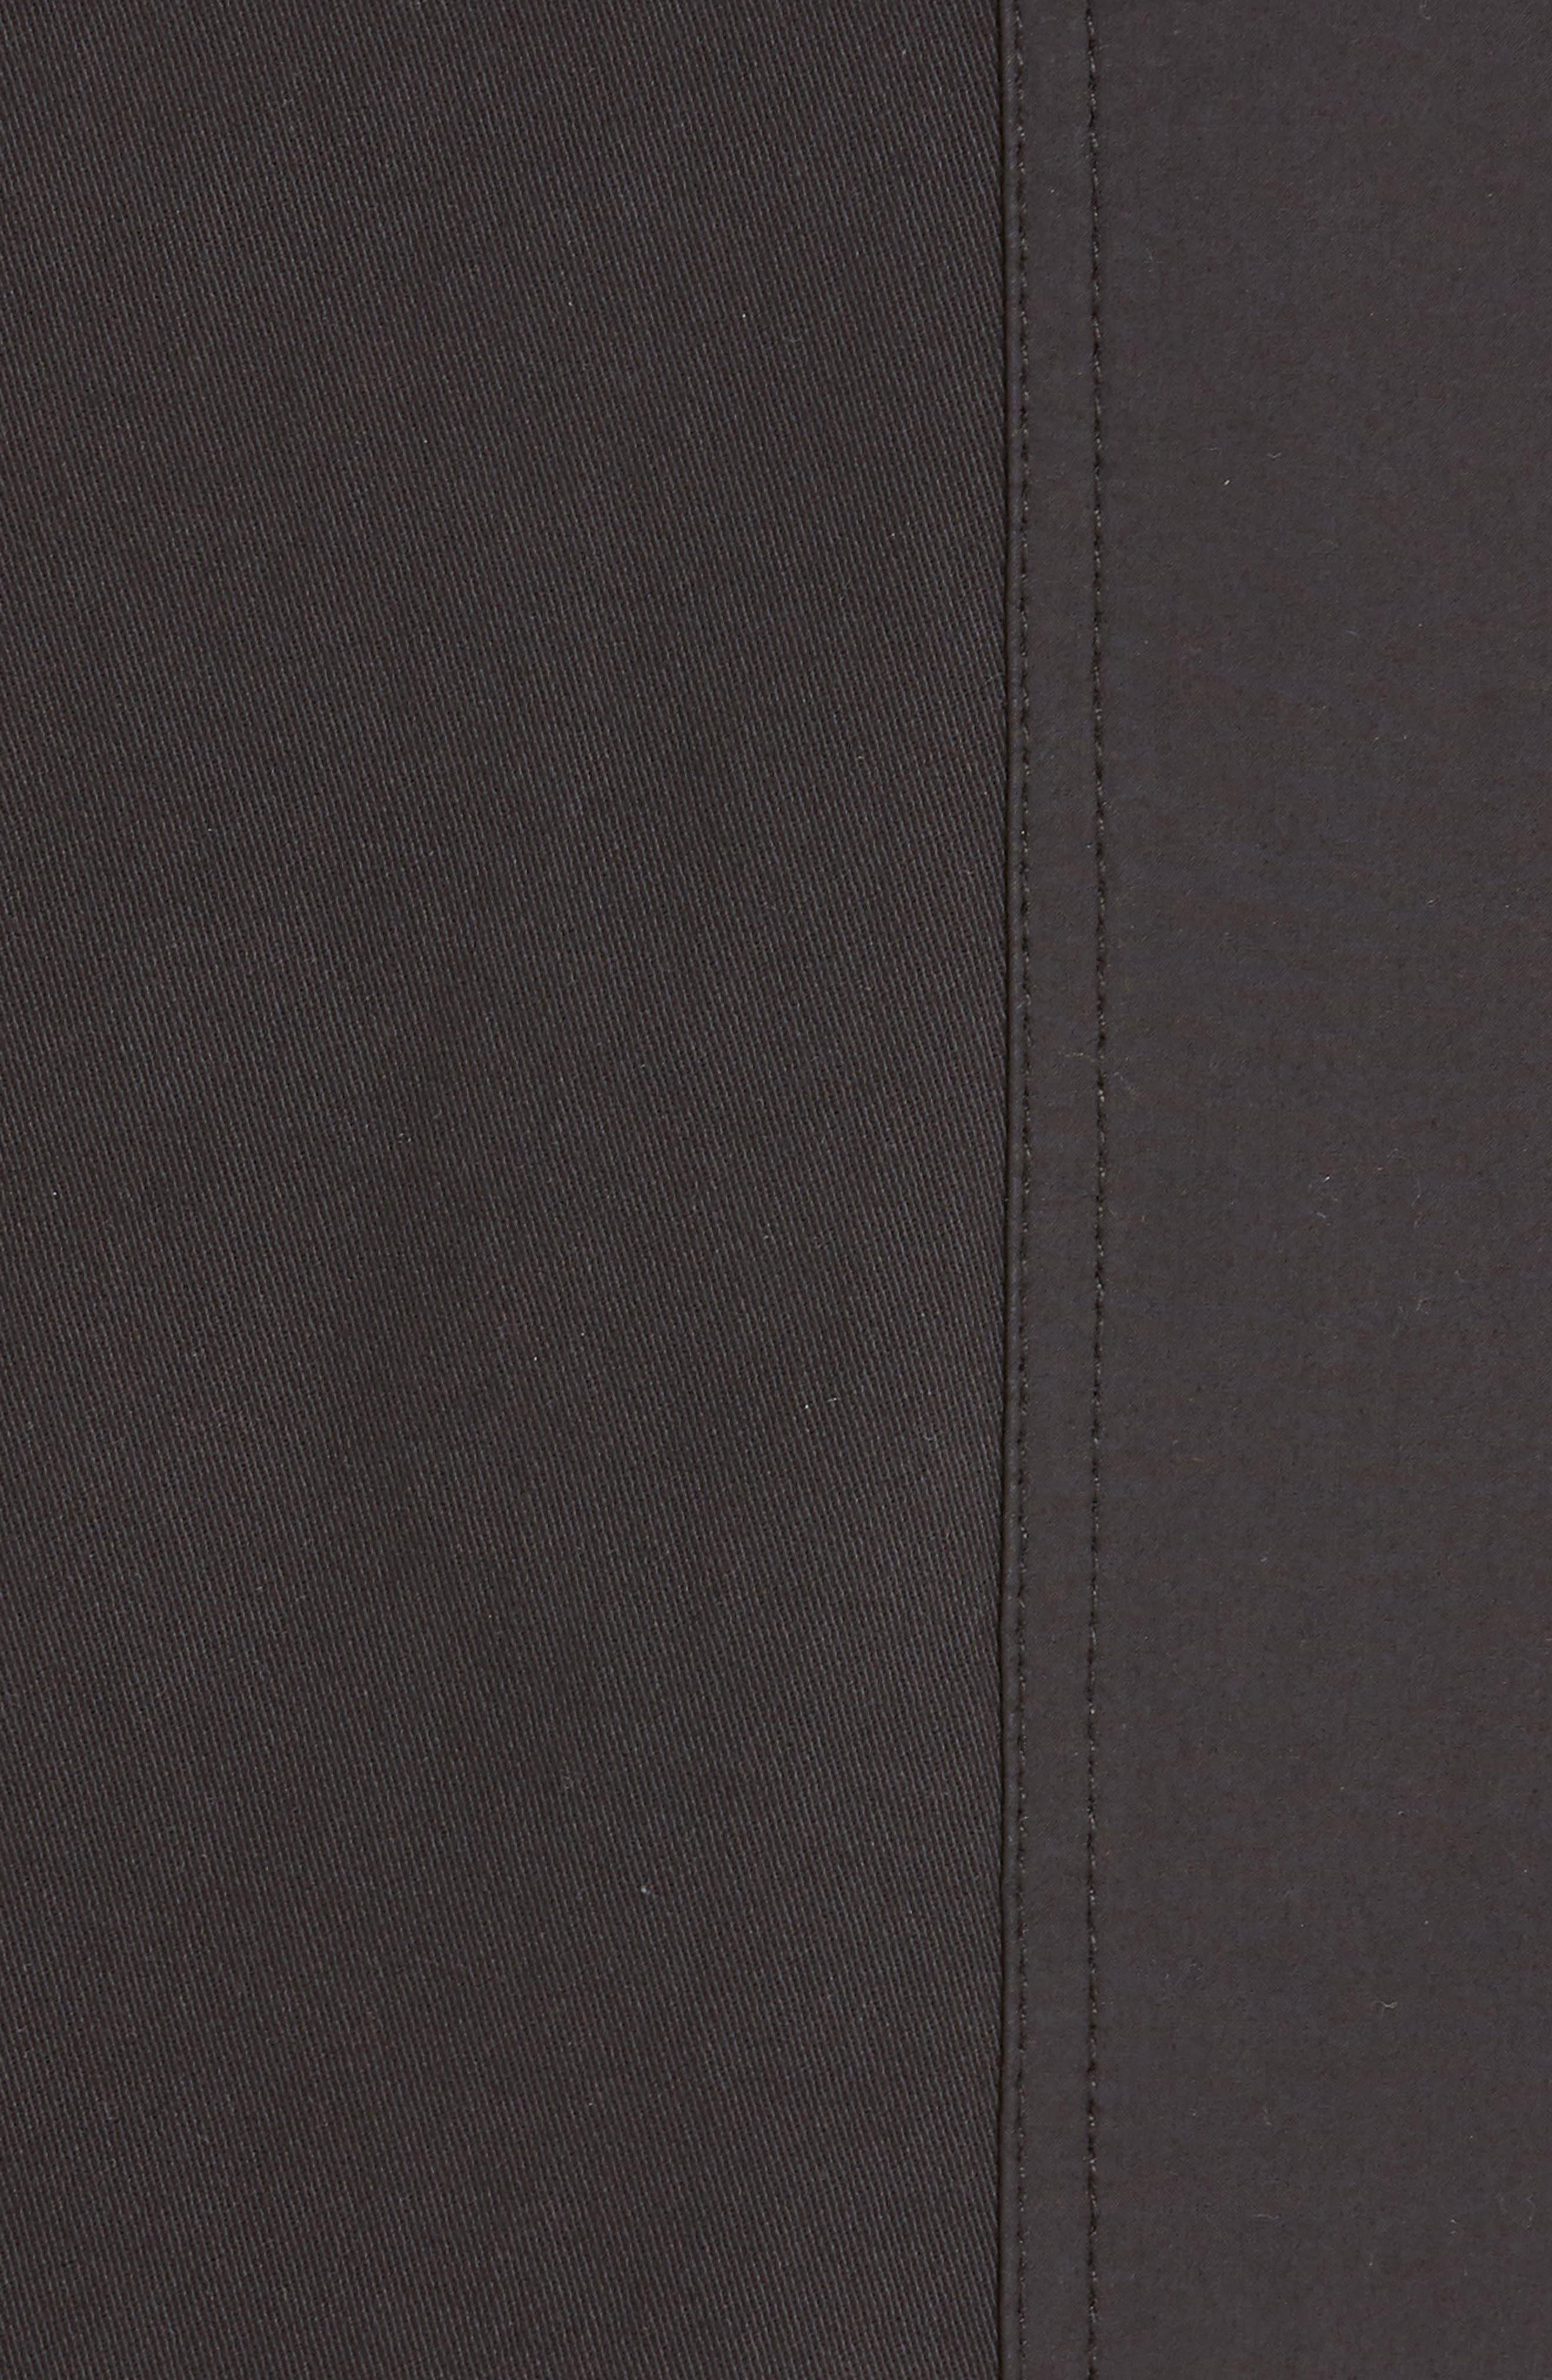 PROENZA SCHOULER, PSWL Belted Utility Skirt, Alternate thumbnail 5, color, BLACK